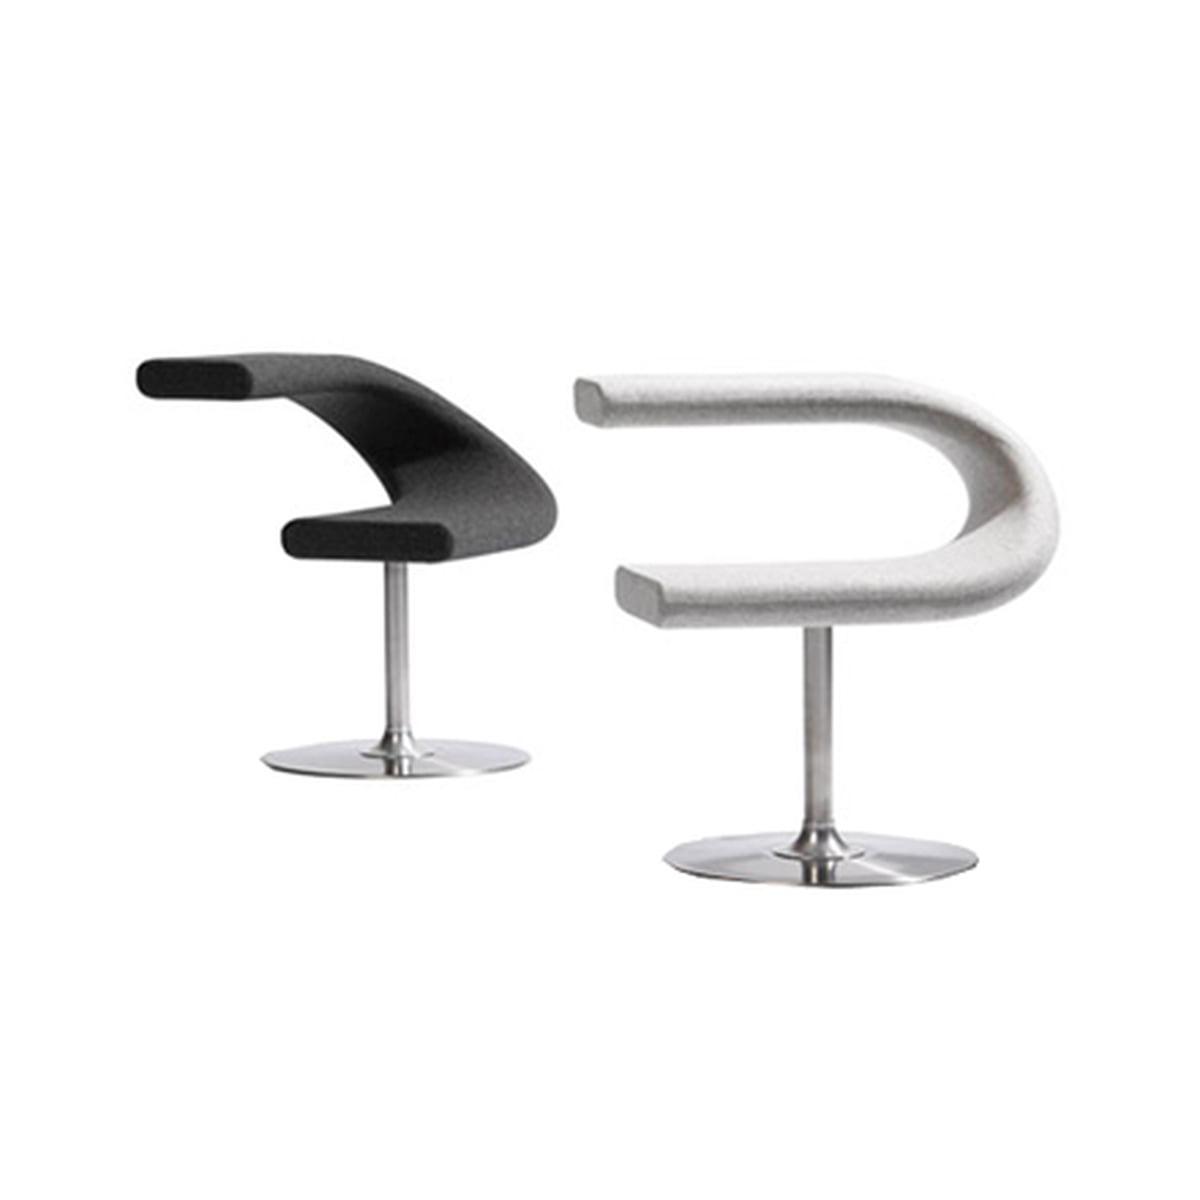 Filzgleiter Panton Chair panton chair original chaise verner panton best chair ideas on